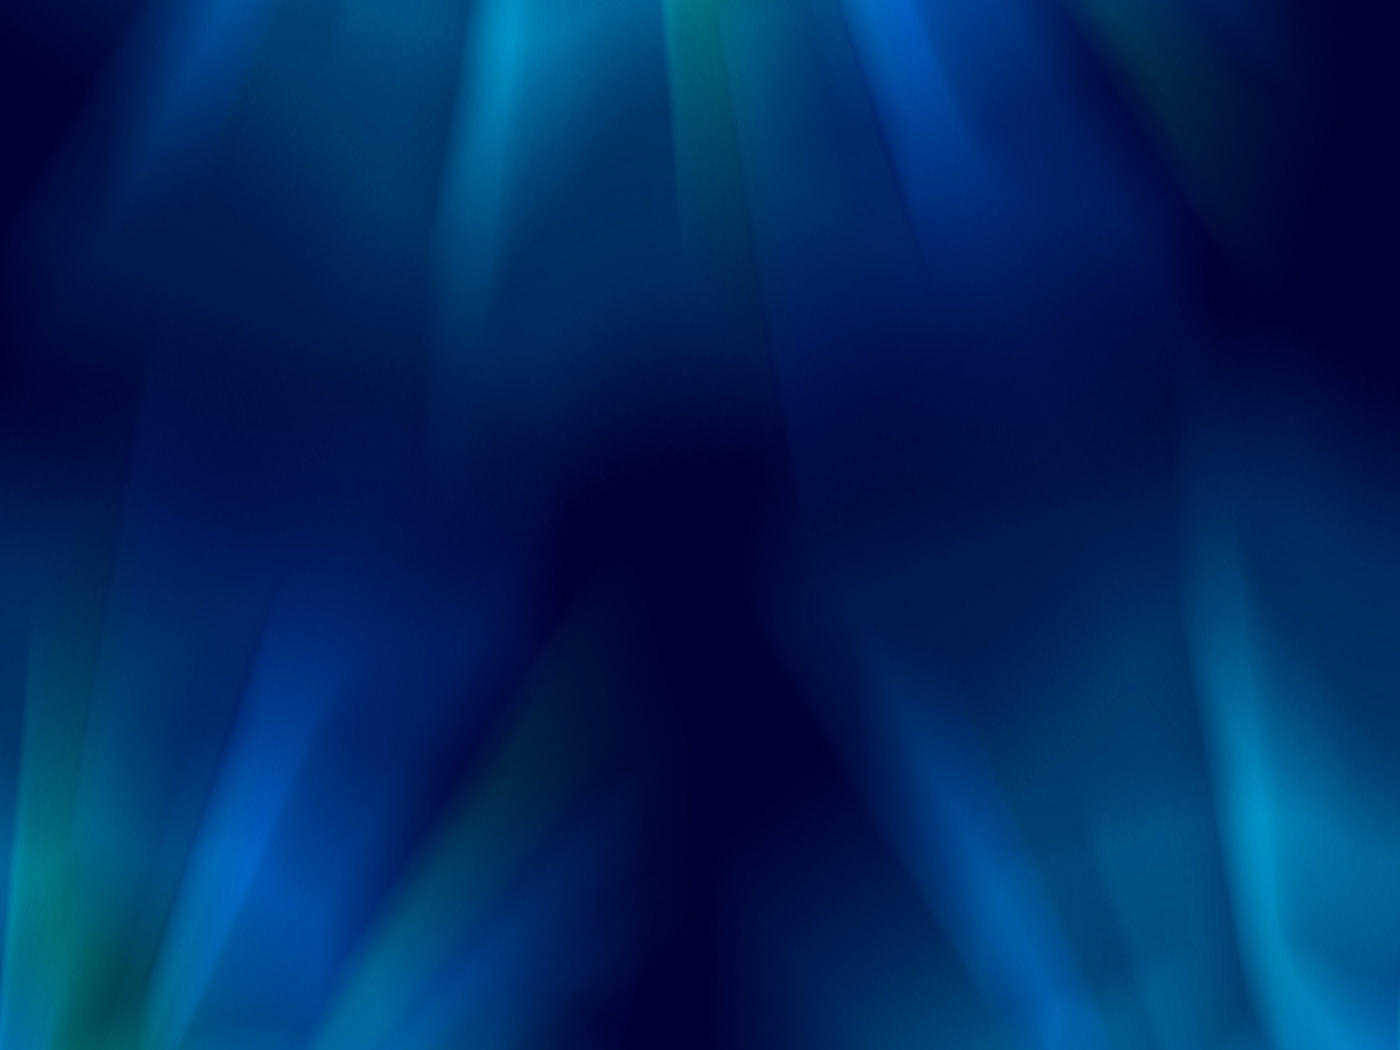 Blau 016 - Blaues Hintergrundbild